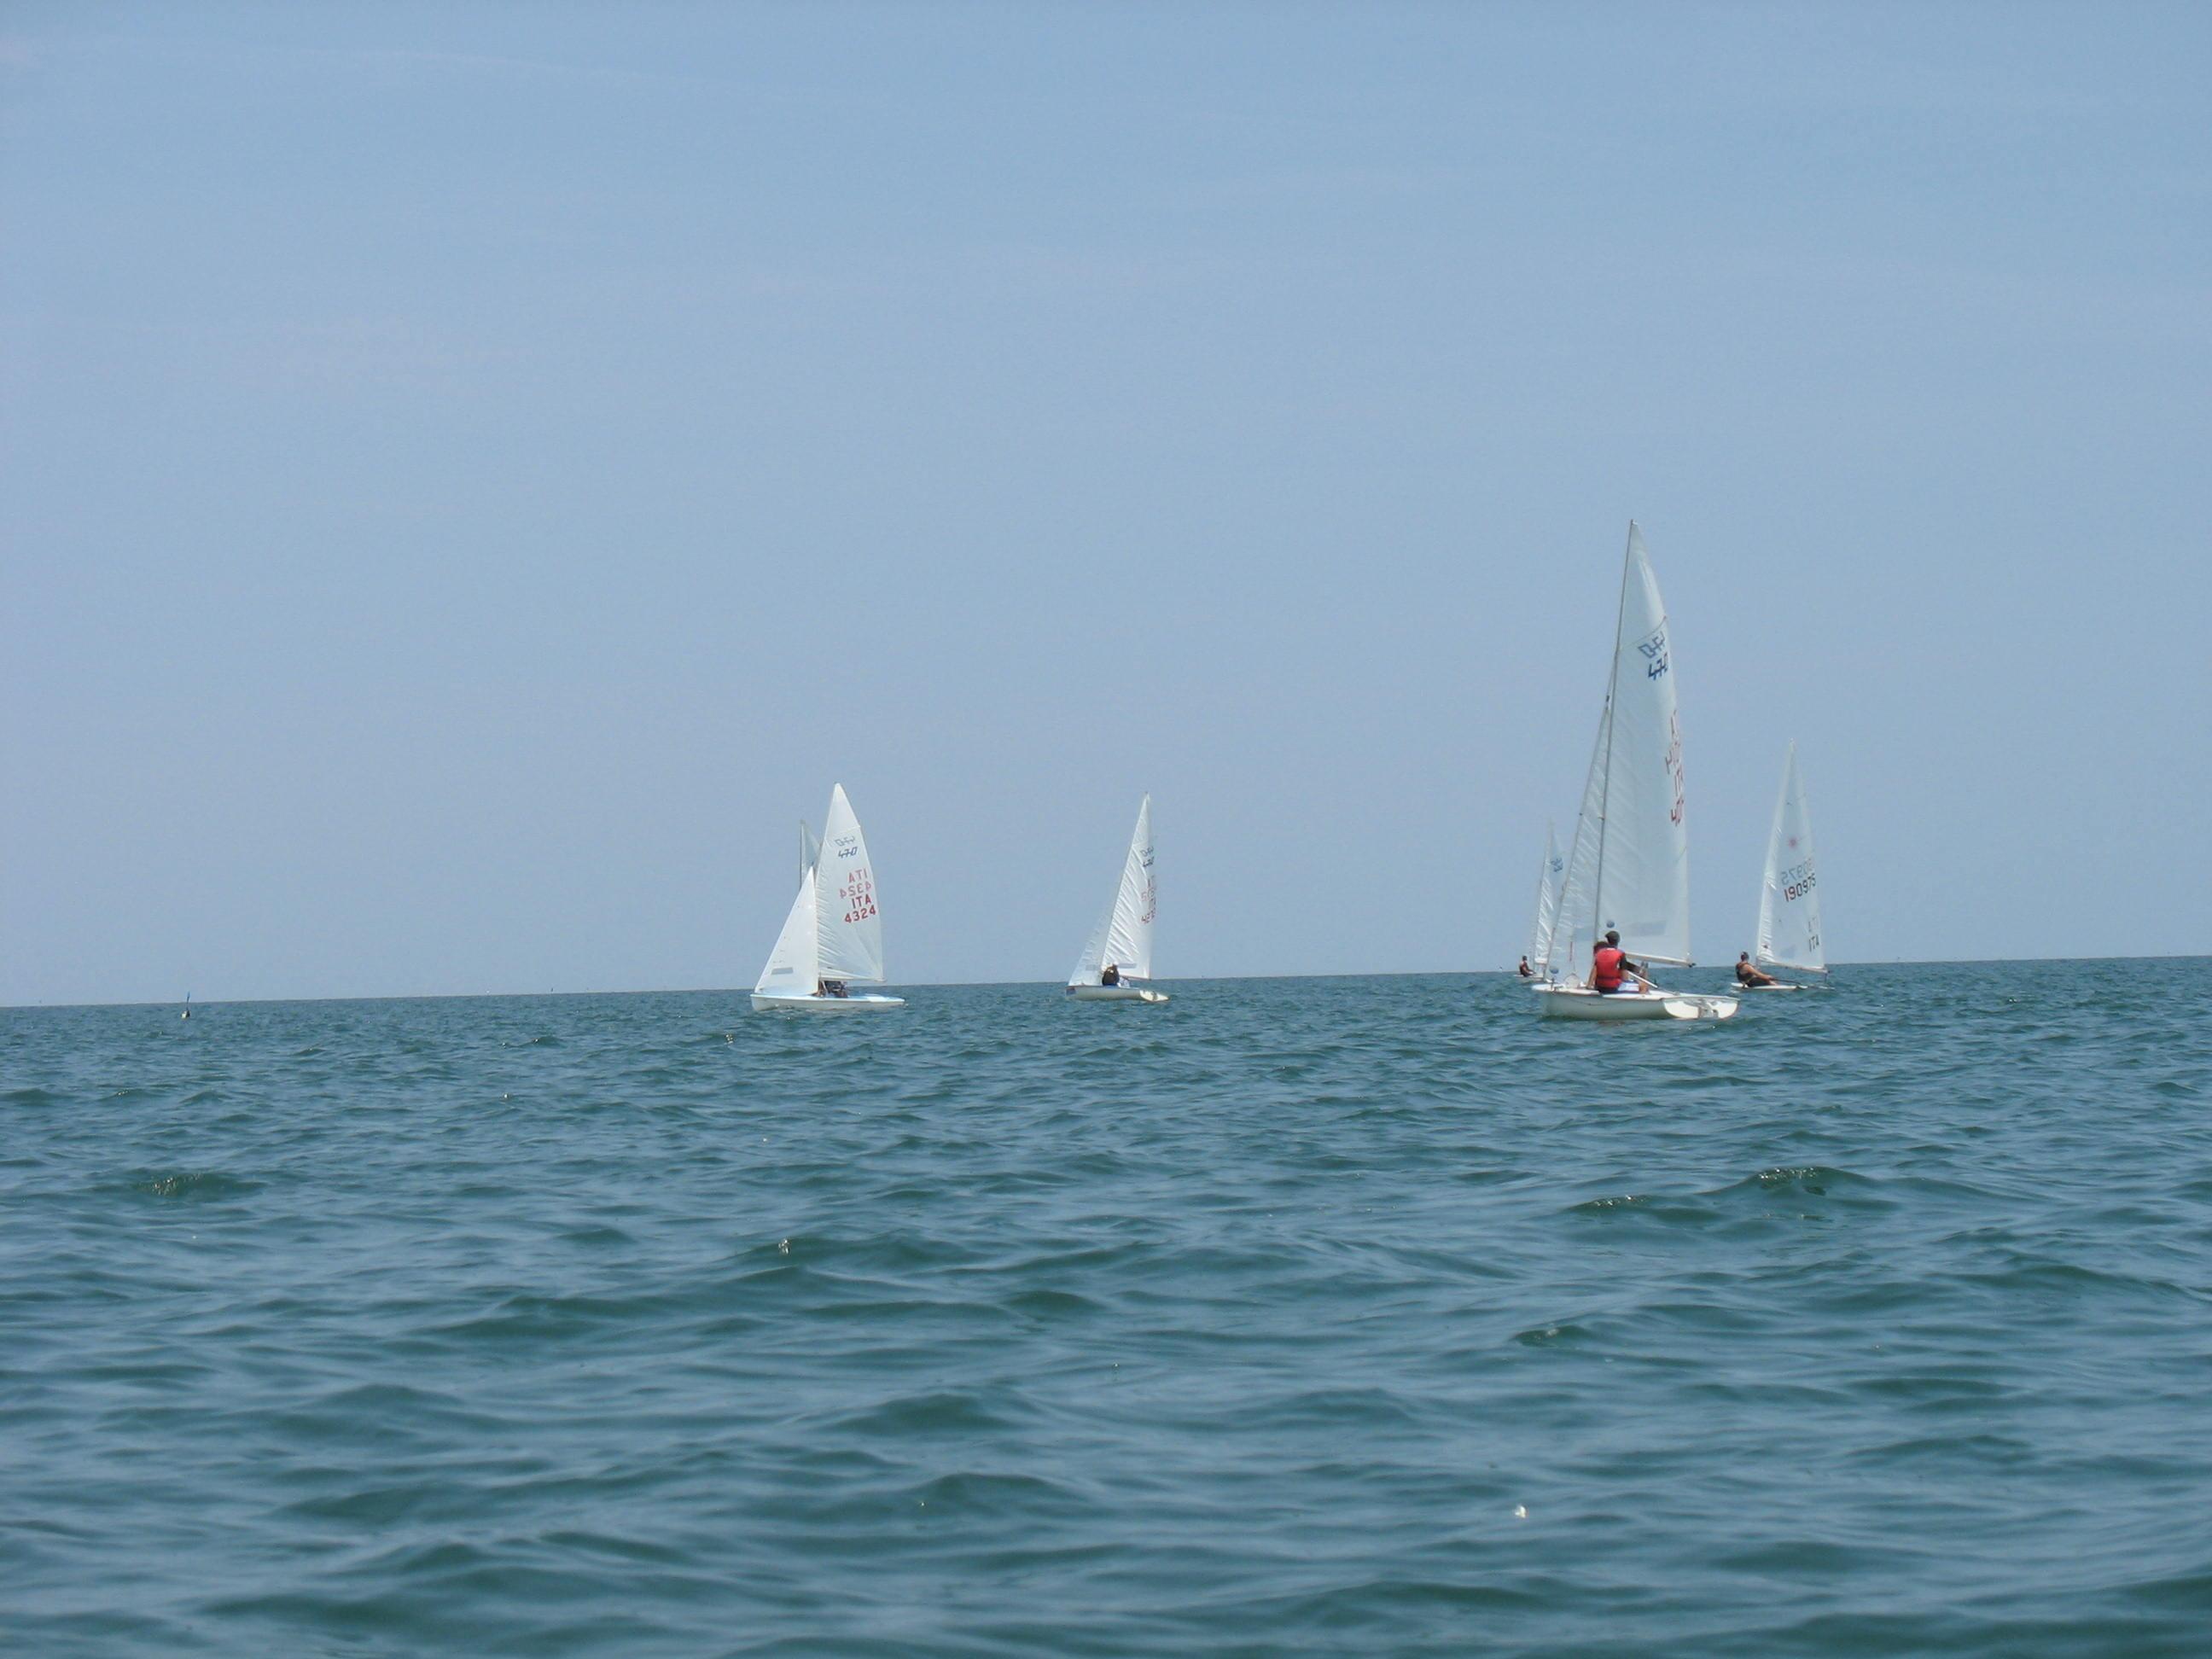 5-torneo-elia-tonelli-27062010-085